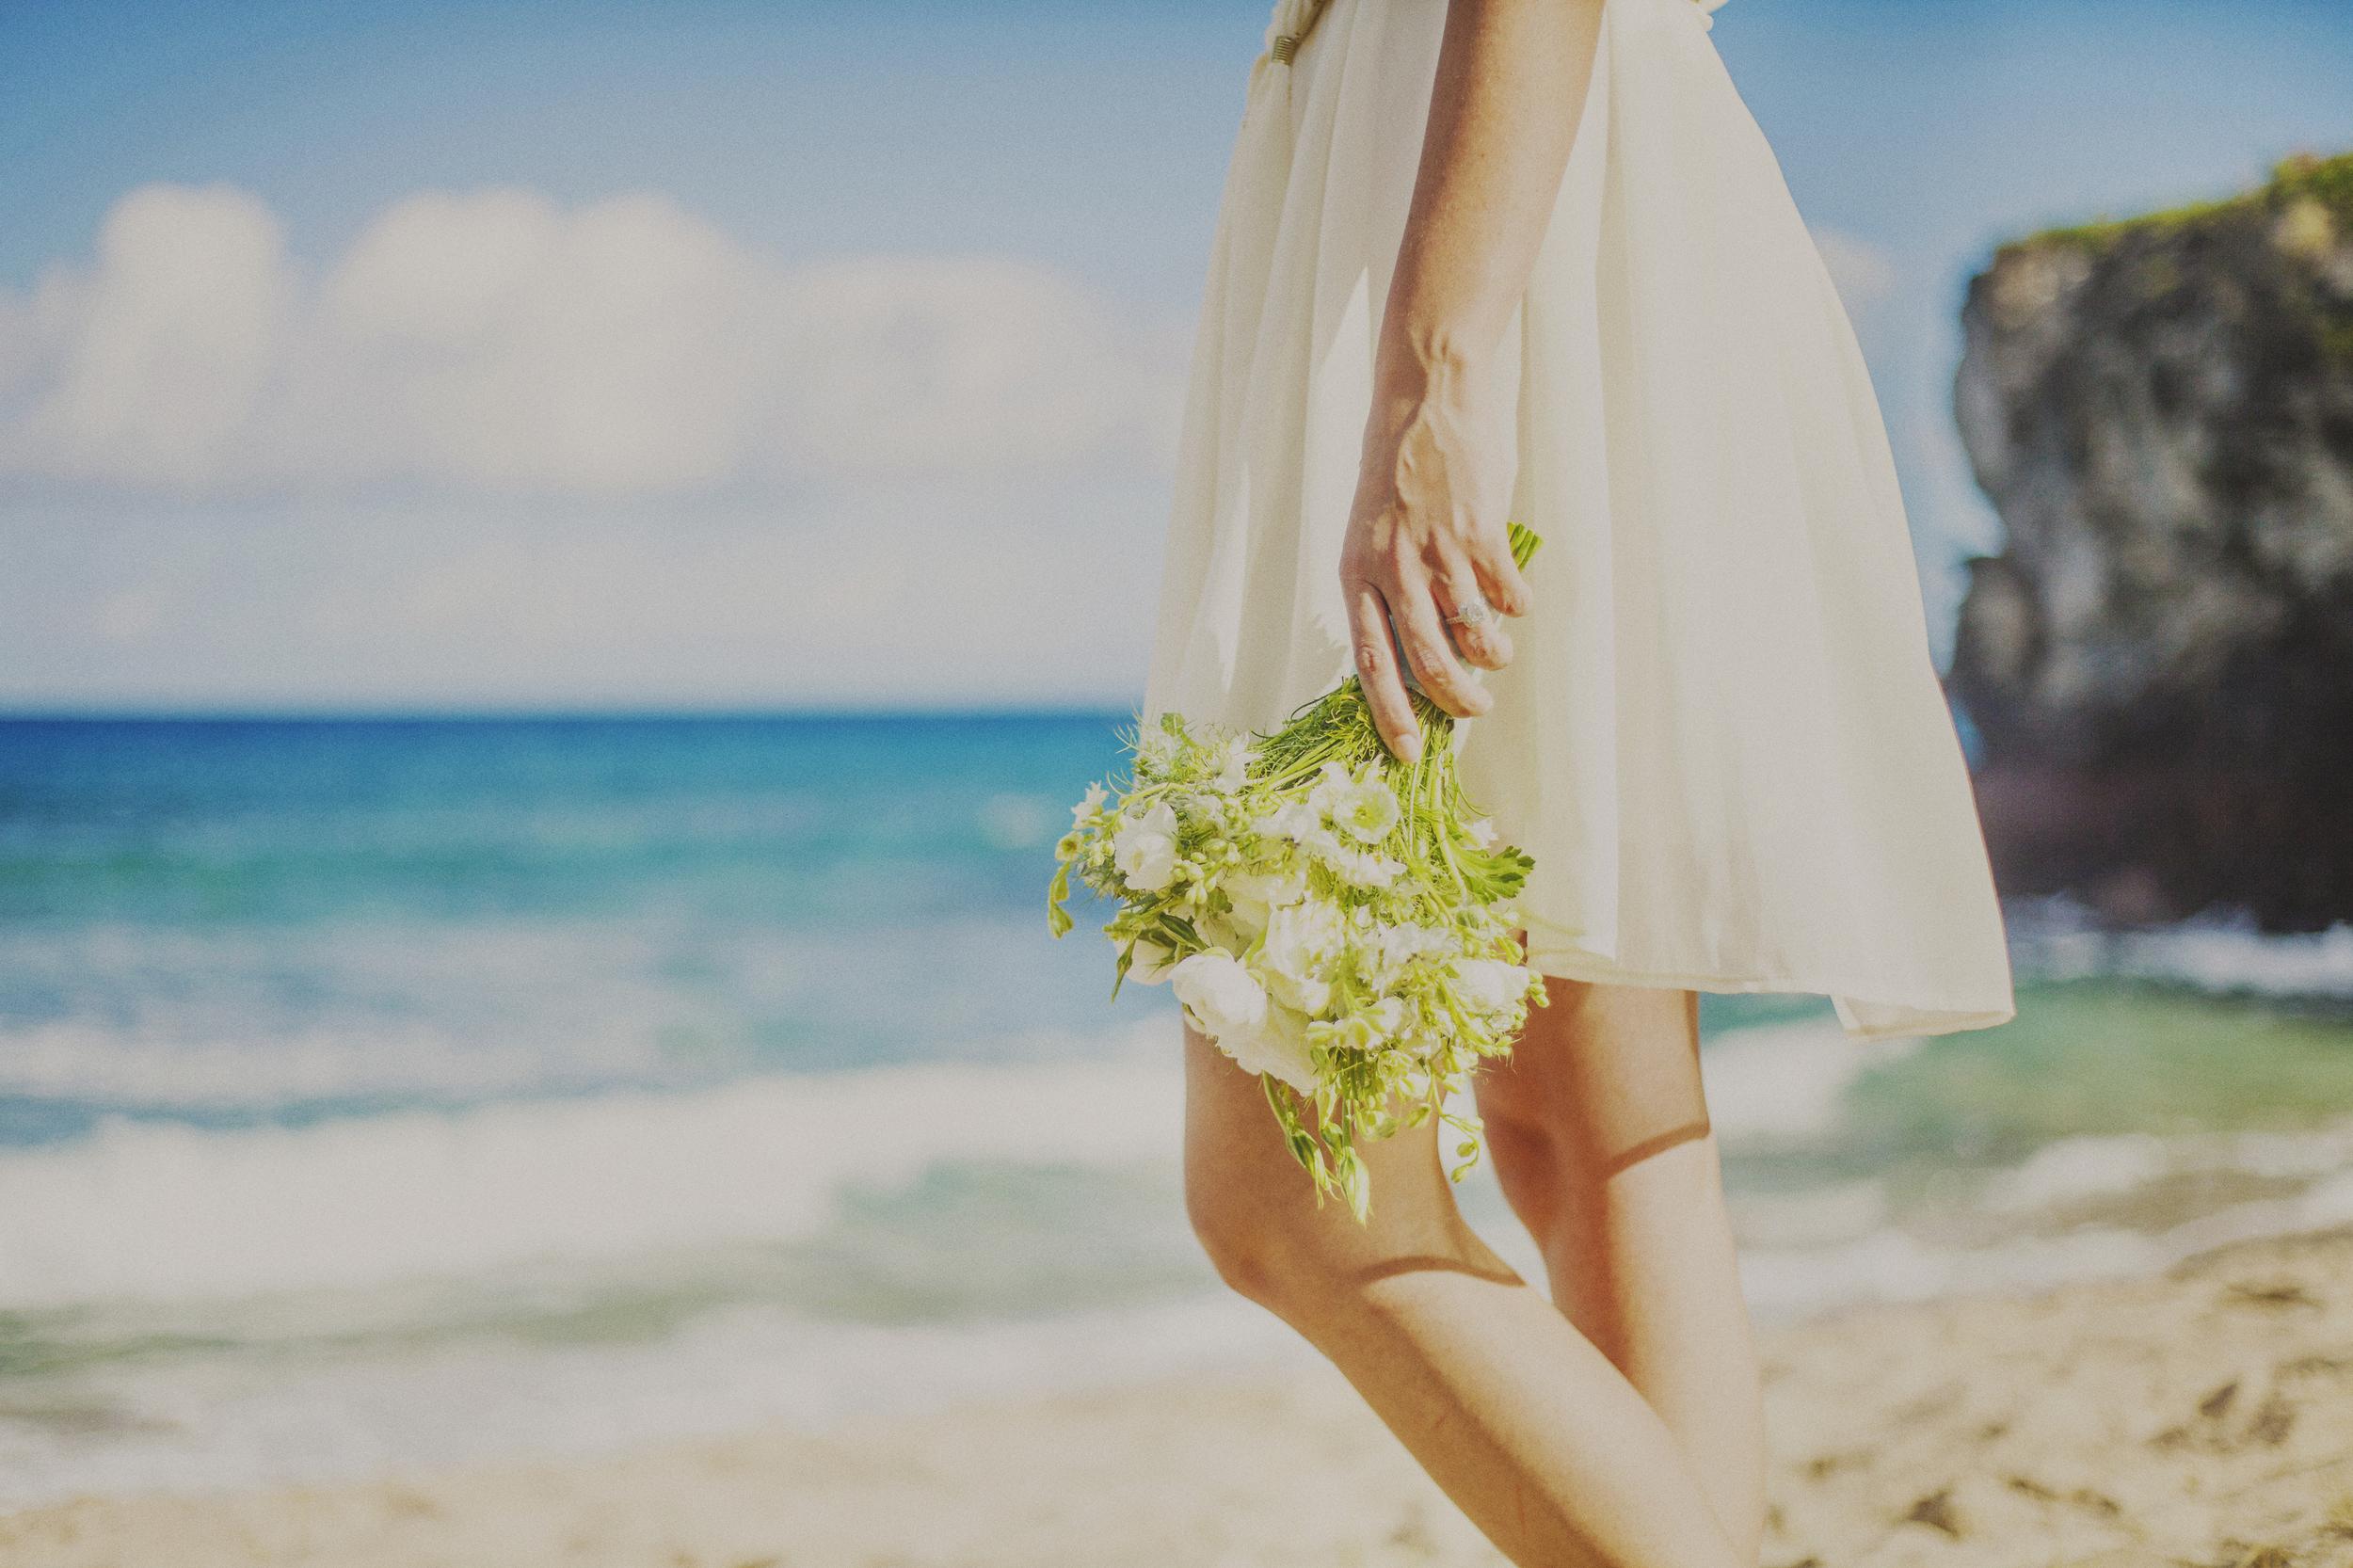 angie-diaz-photography-maui-elopement-oneloa-ironwoods-beach-27.jpg